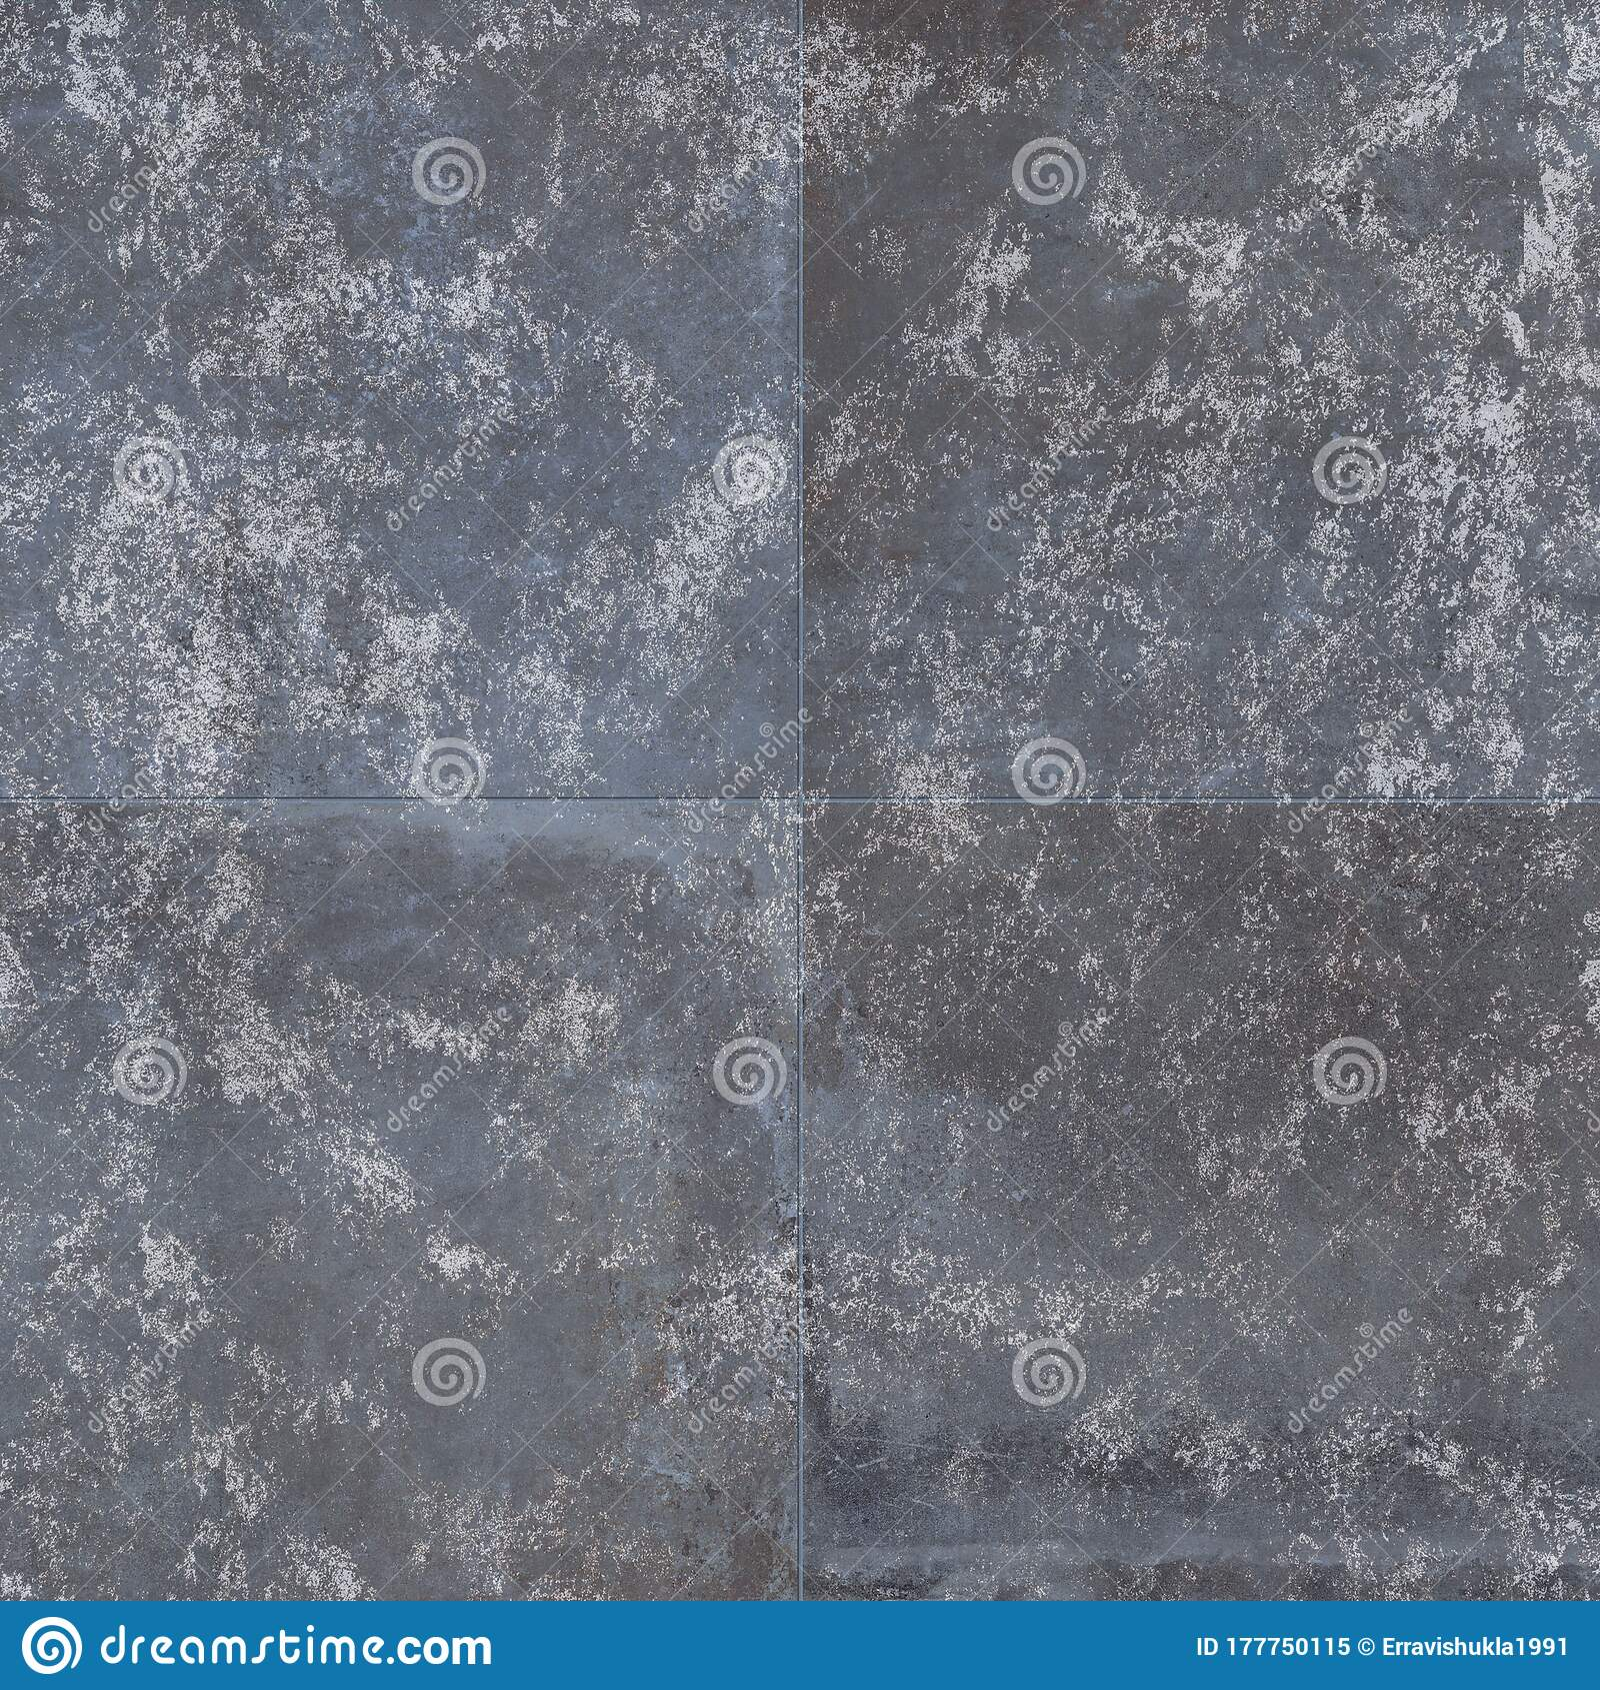 Abstract Grunge Decorative Navy Blue Dark Stucco Wall